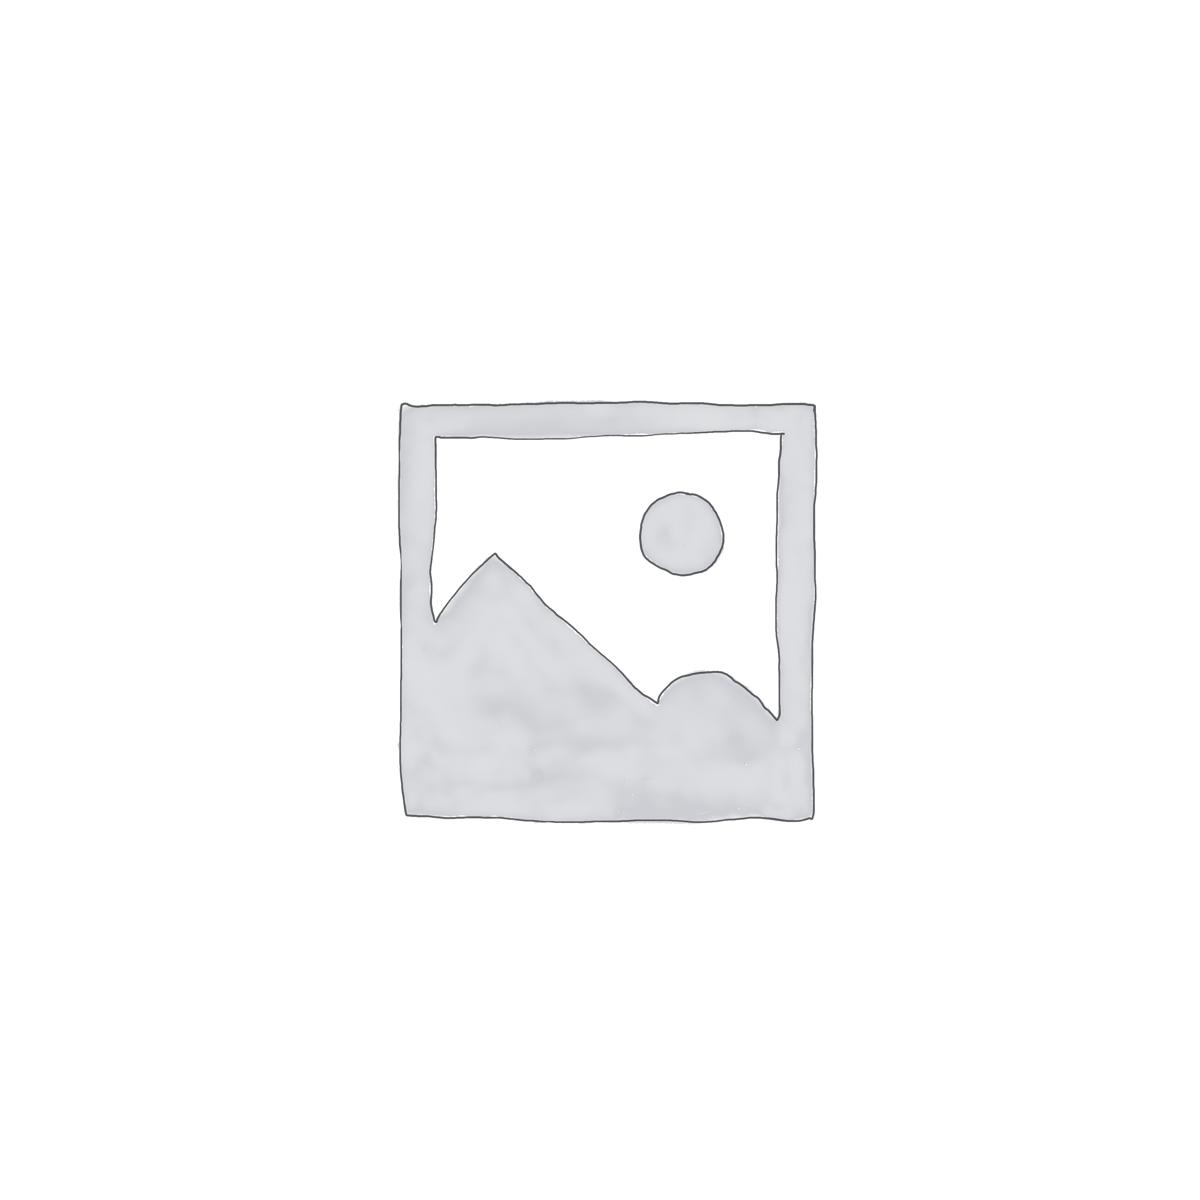 Vintage Pastel Pink Floral Wallpaper Mural